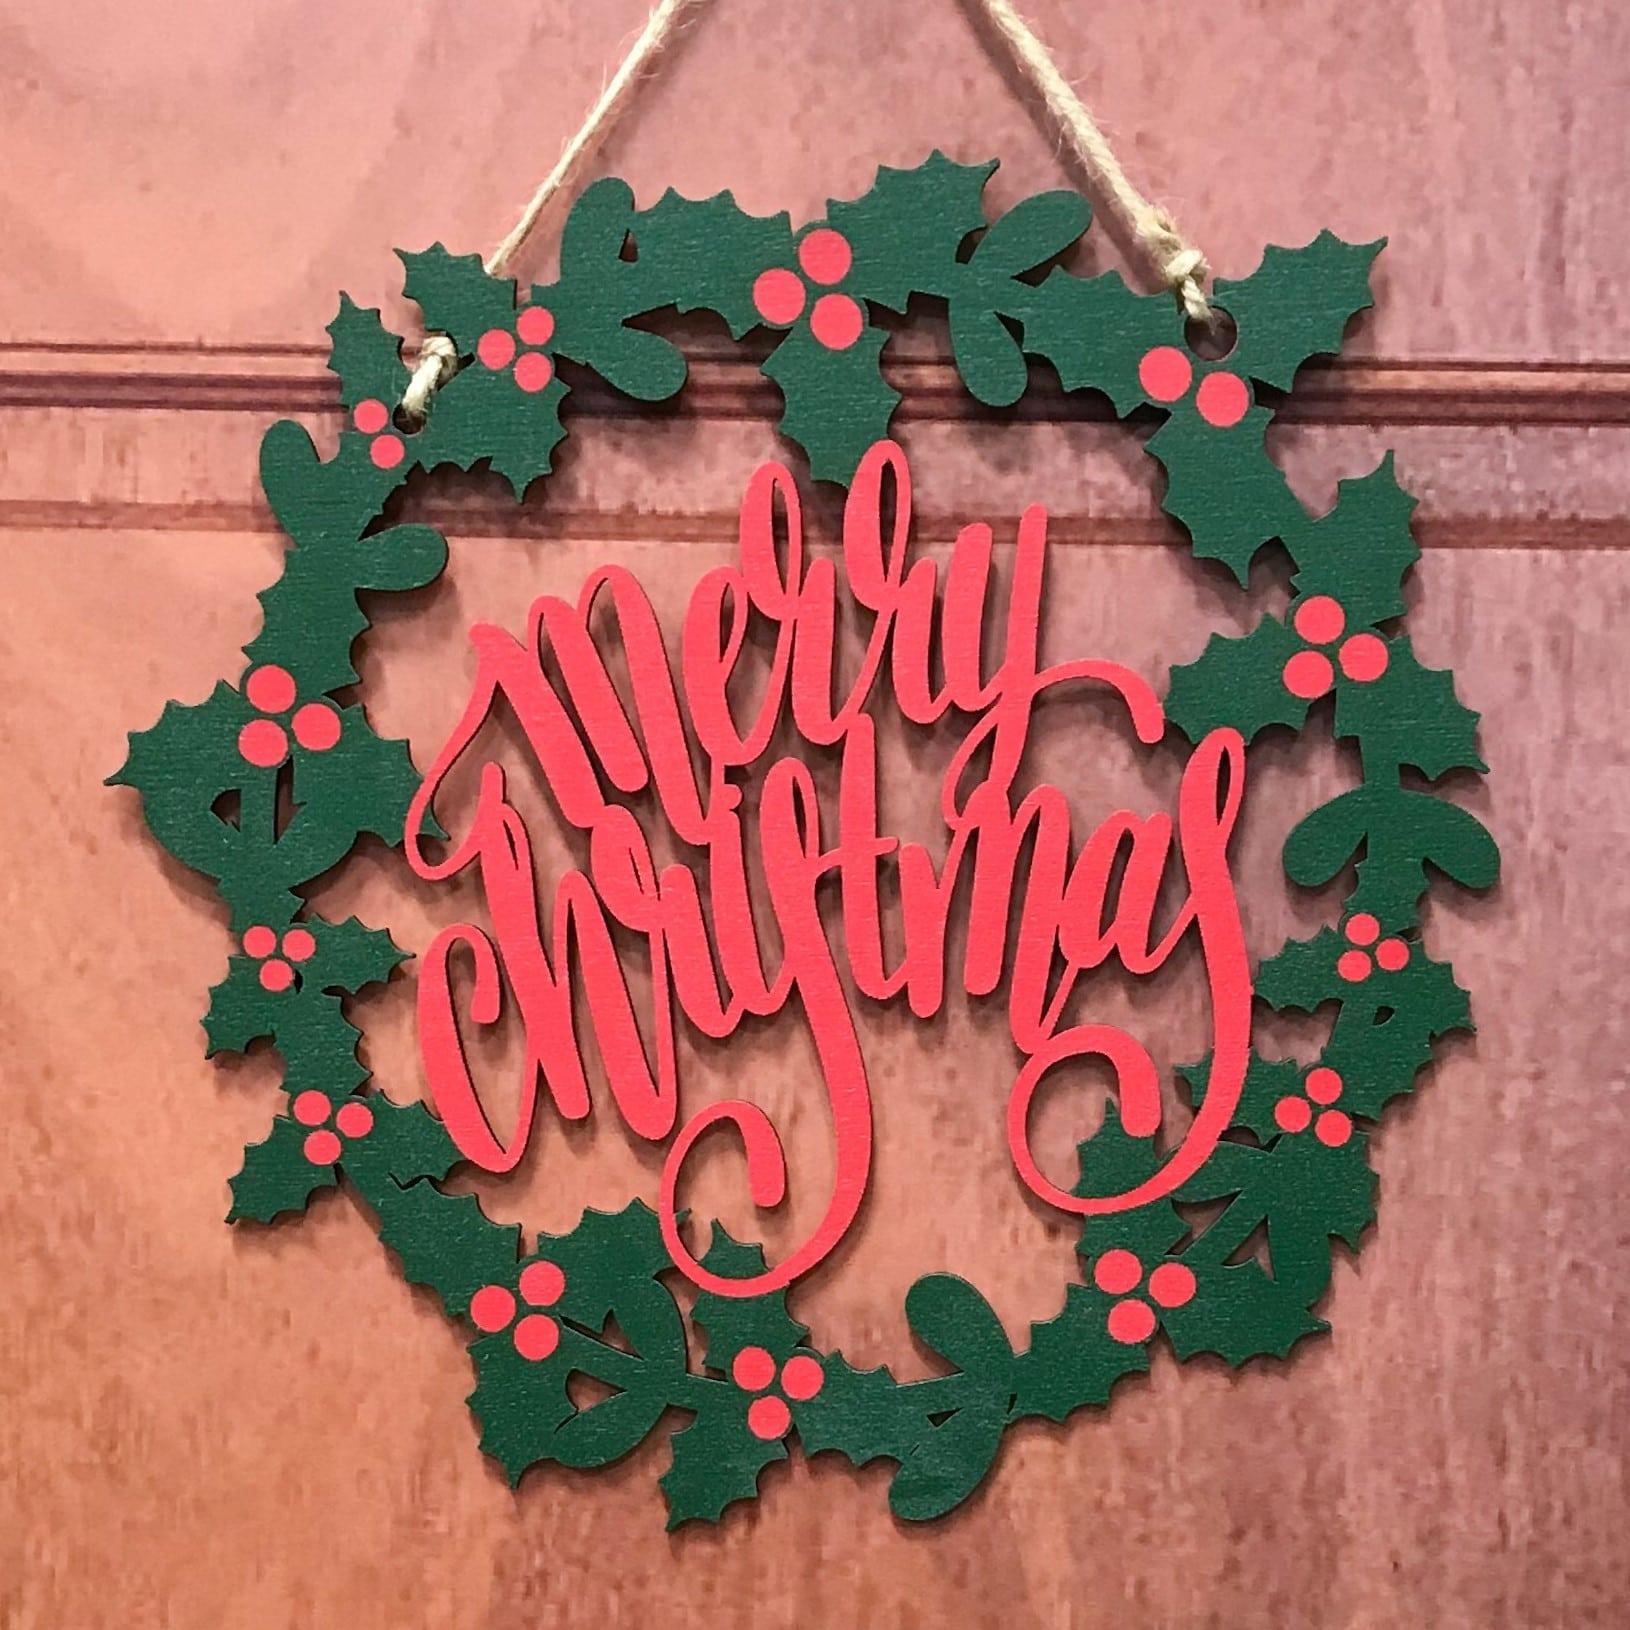 ghirlanda-merry-christmas-natale-decorazione